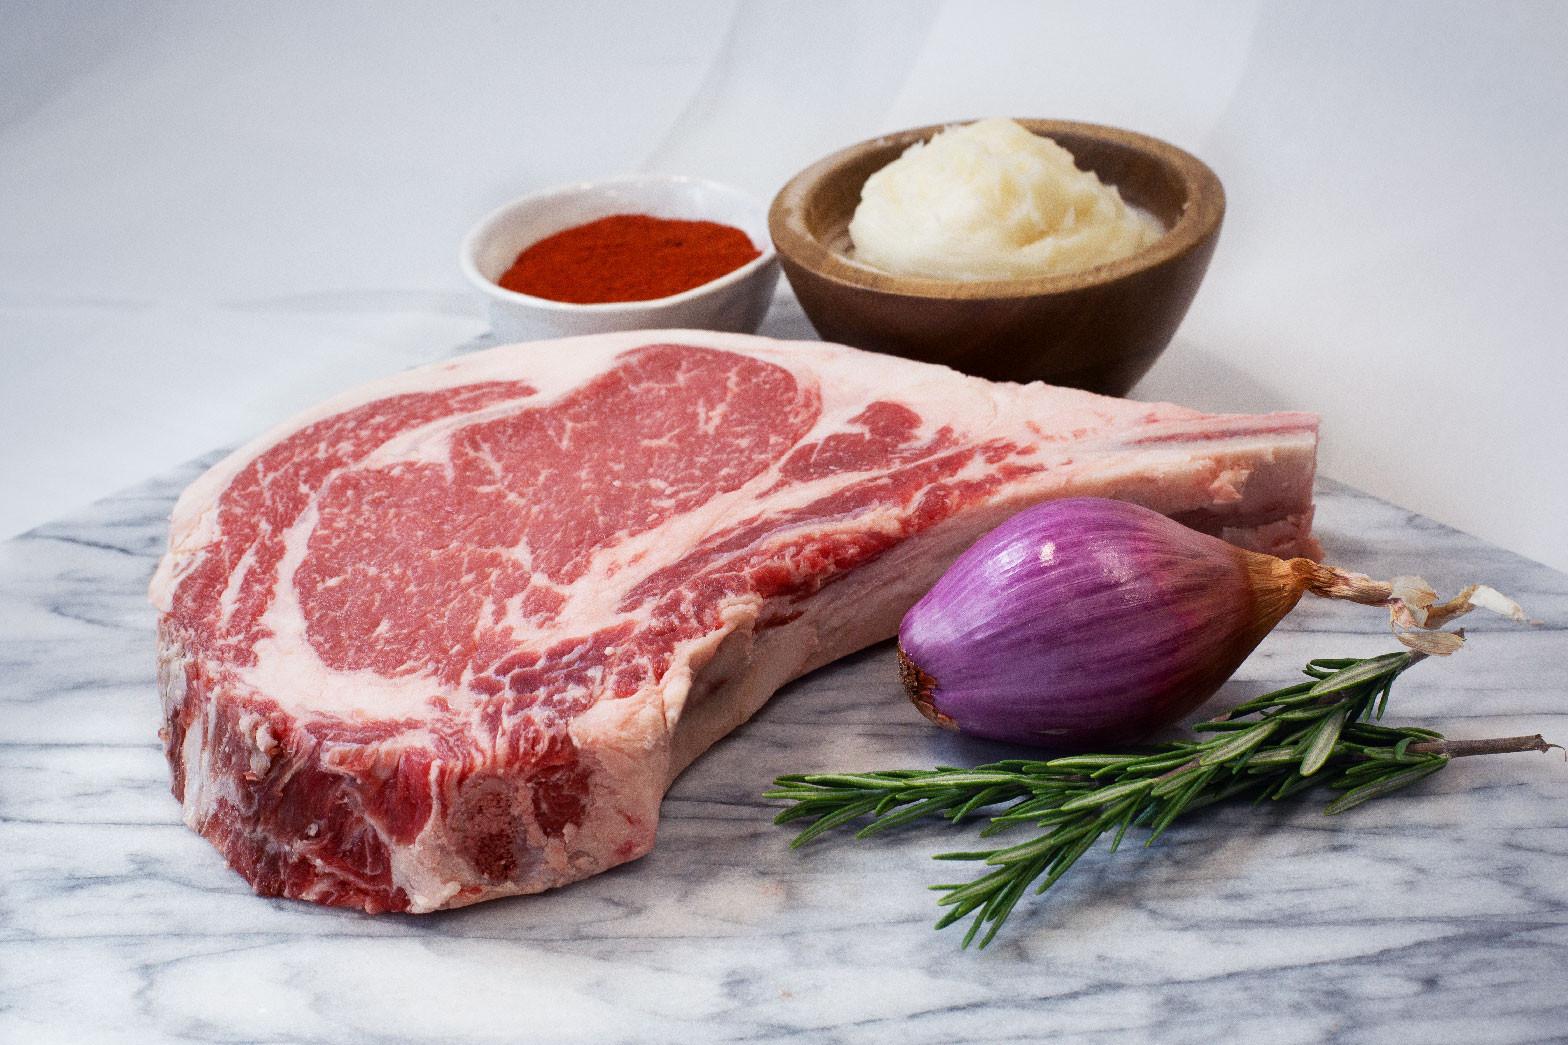 Bone-In Ribeye Steak